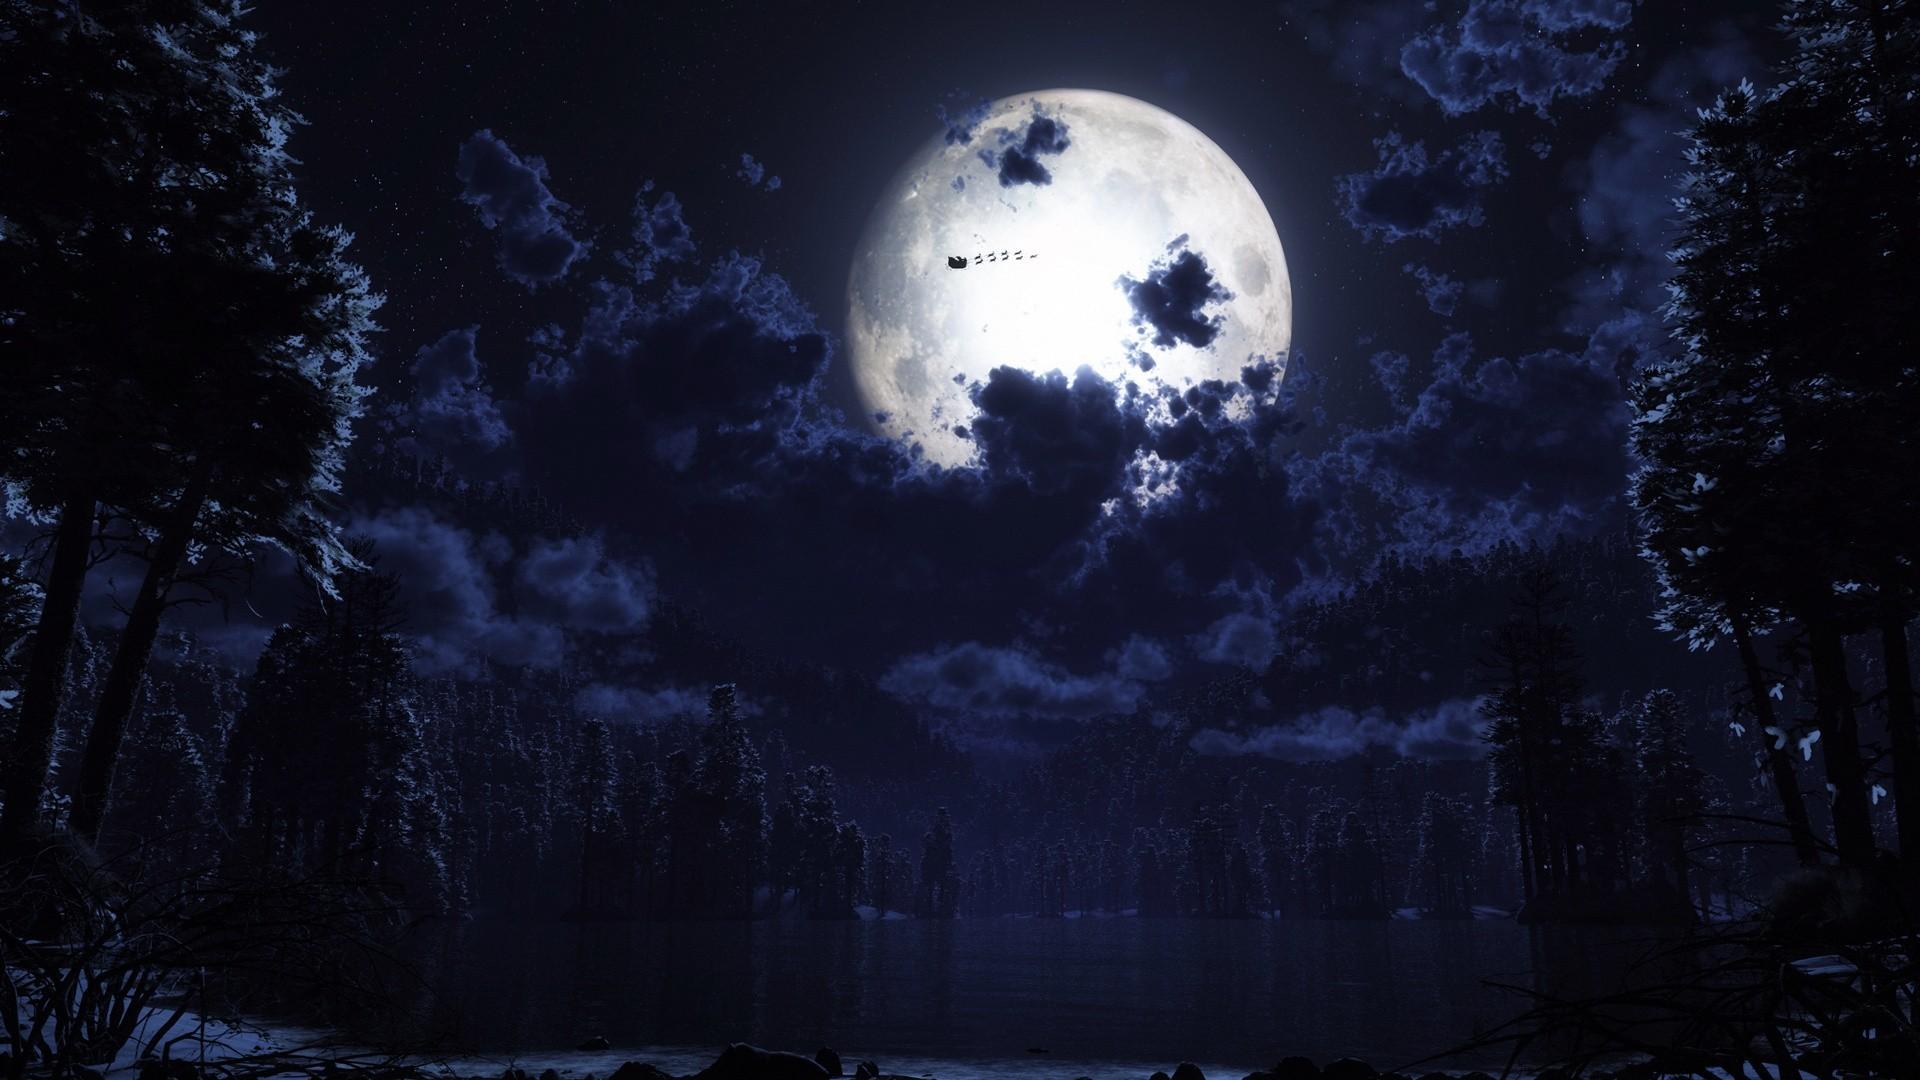 Night Wallpaper image hd